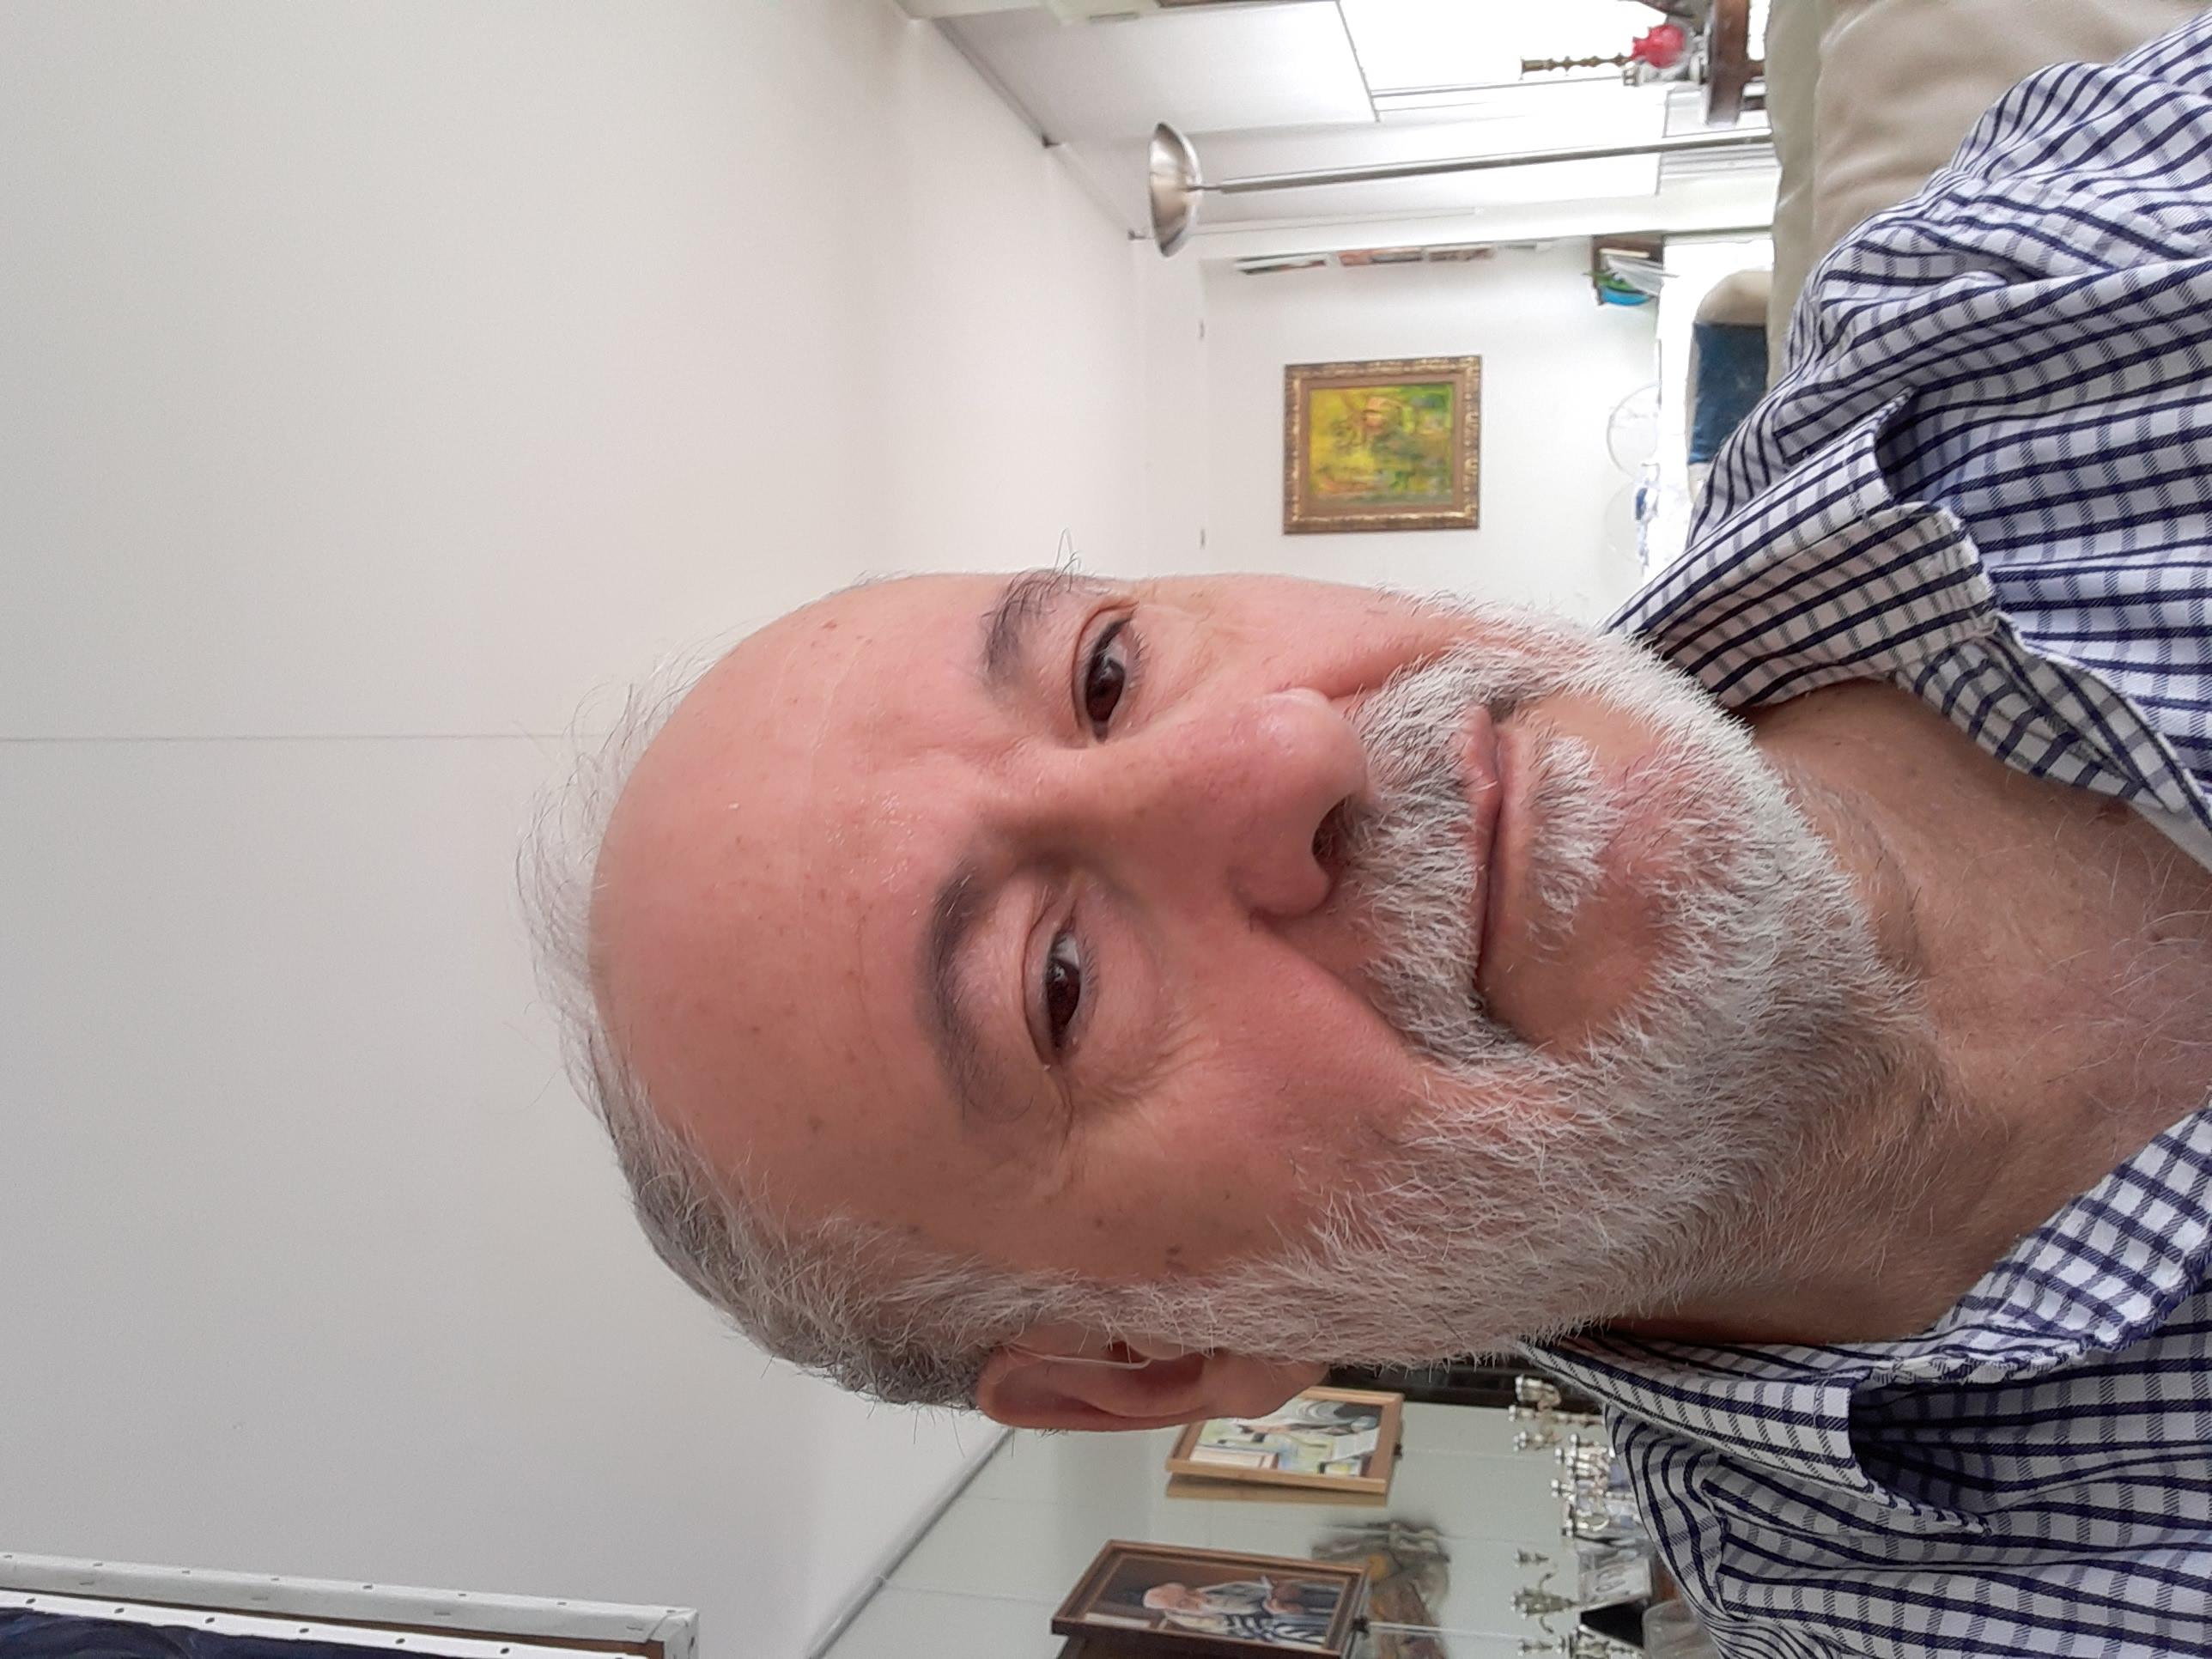 DR JACOB AMSELLEM